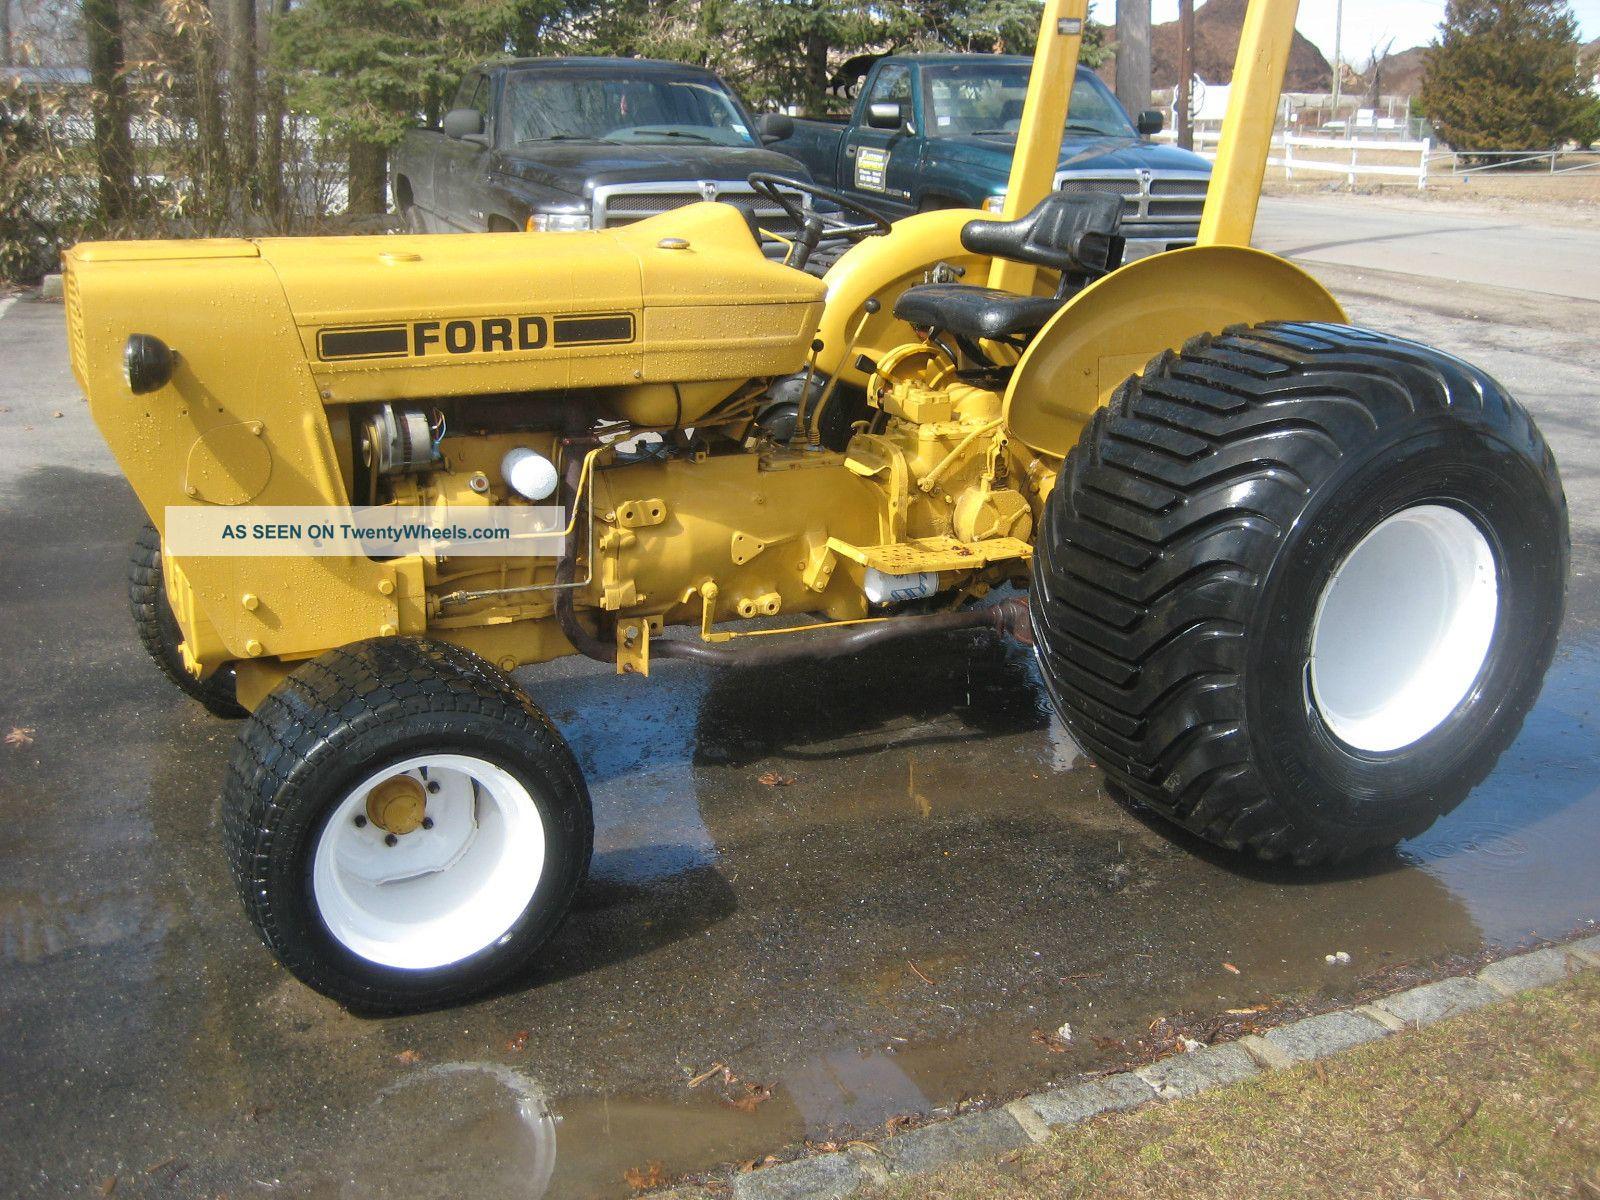 Ford Tractor,  3 Cylinder Diesel Backhoe Loaders photo